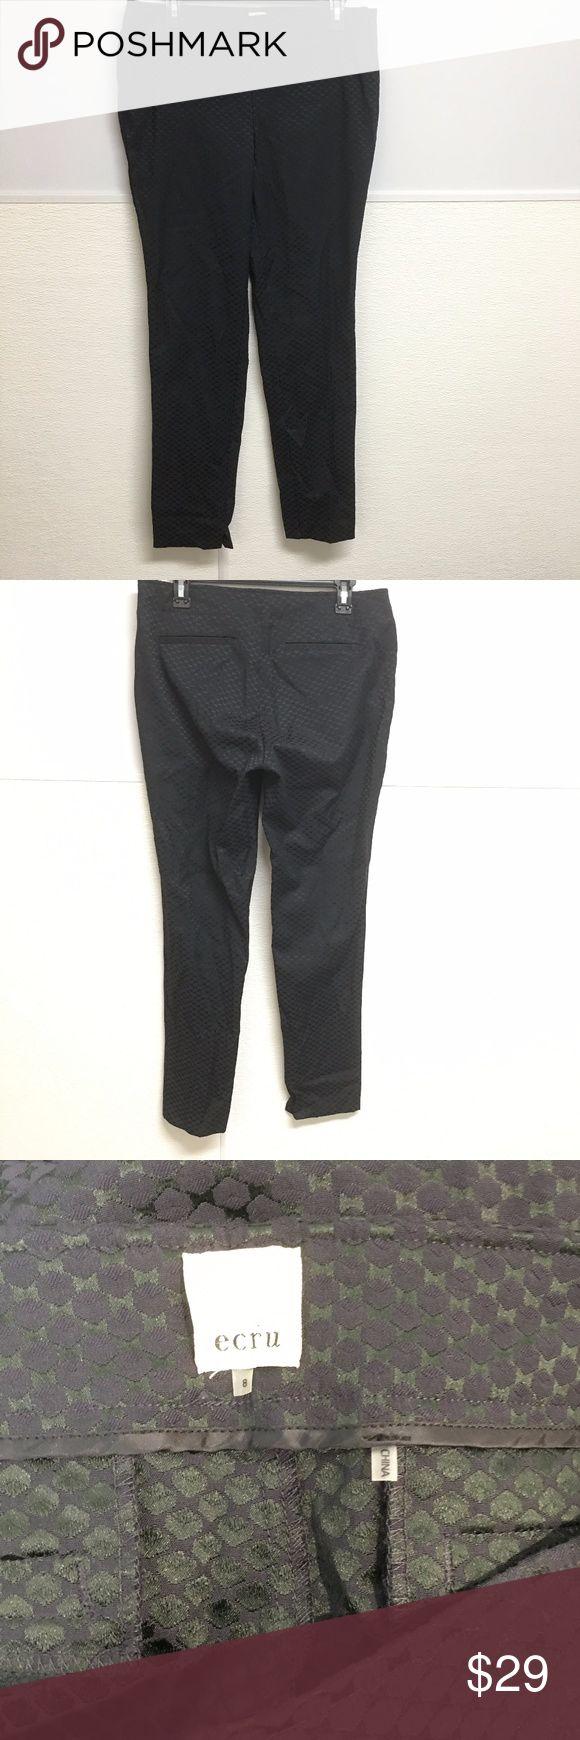 "ECRU NWT Costello Trouser Pants Printed Sleek 8 NWTs!! Brand - ECRU Size - 8 Costello Trouser Pants Dark Green/Black Print  waist - 16.75"" rise - 9"" bottom leg width - 9"" inseam - 32.5"" Ecru Pants Trousers"